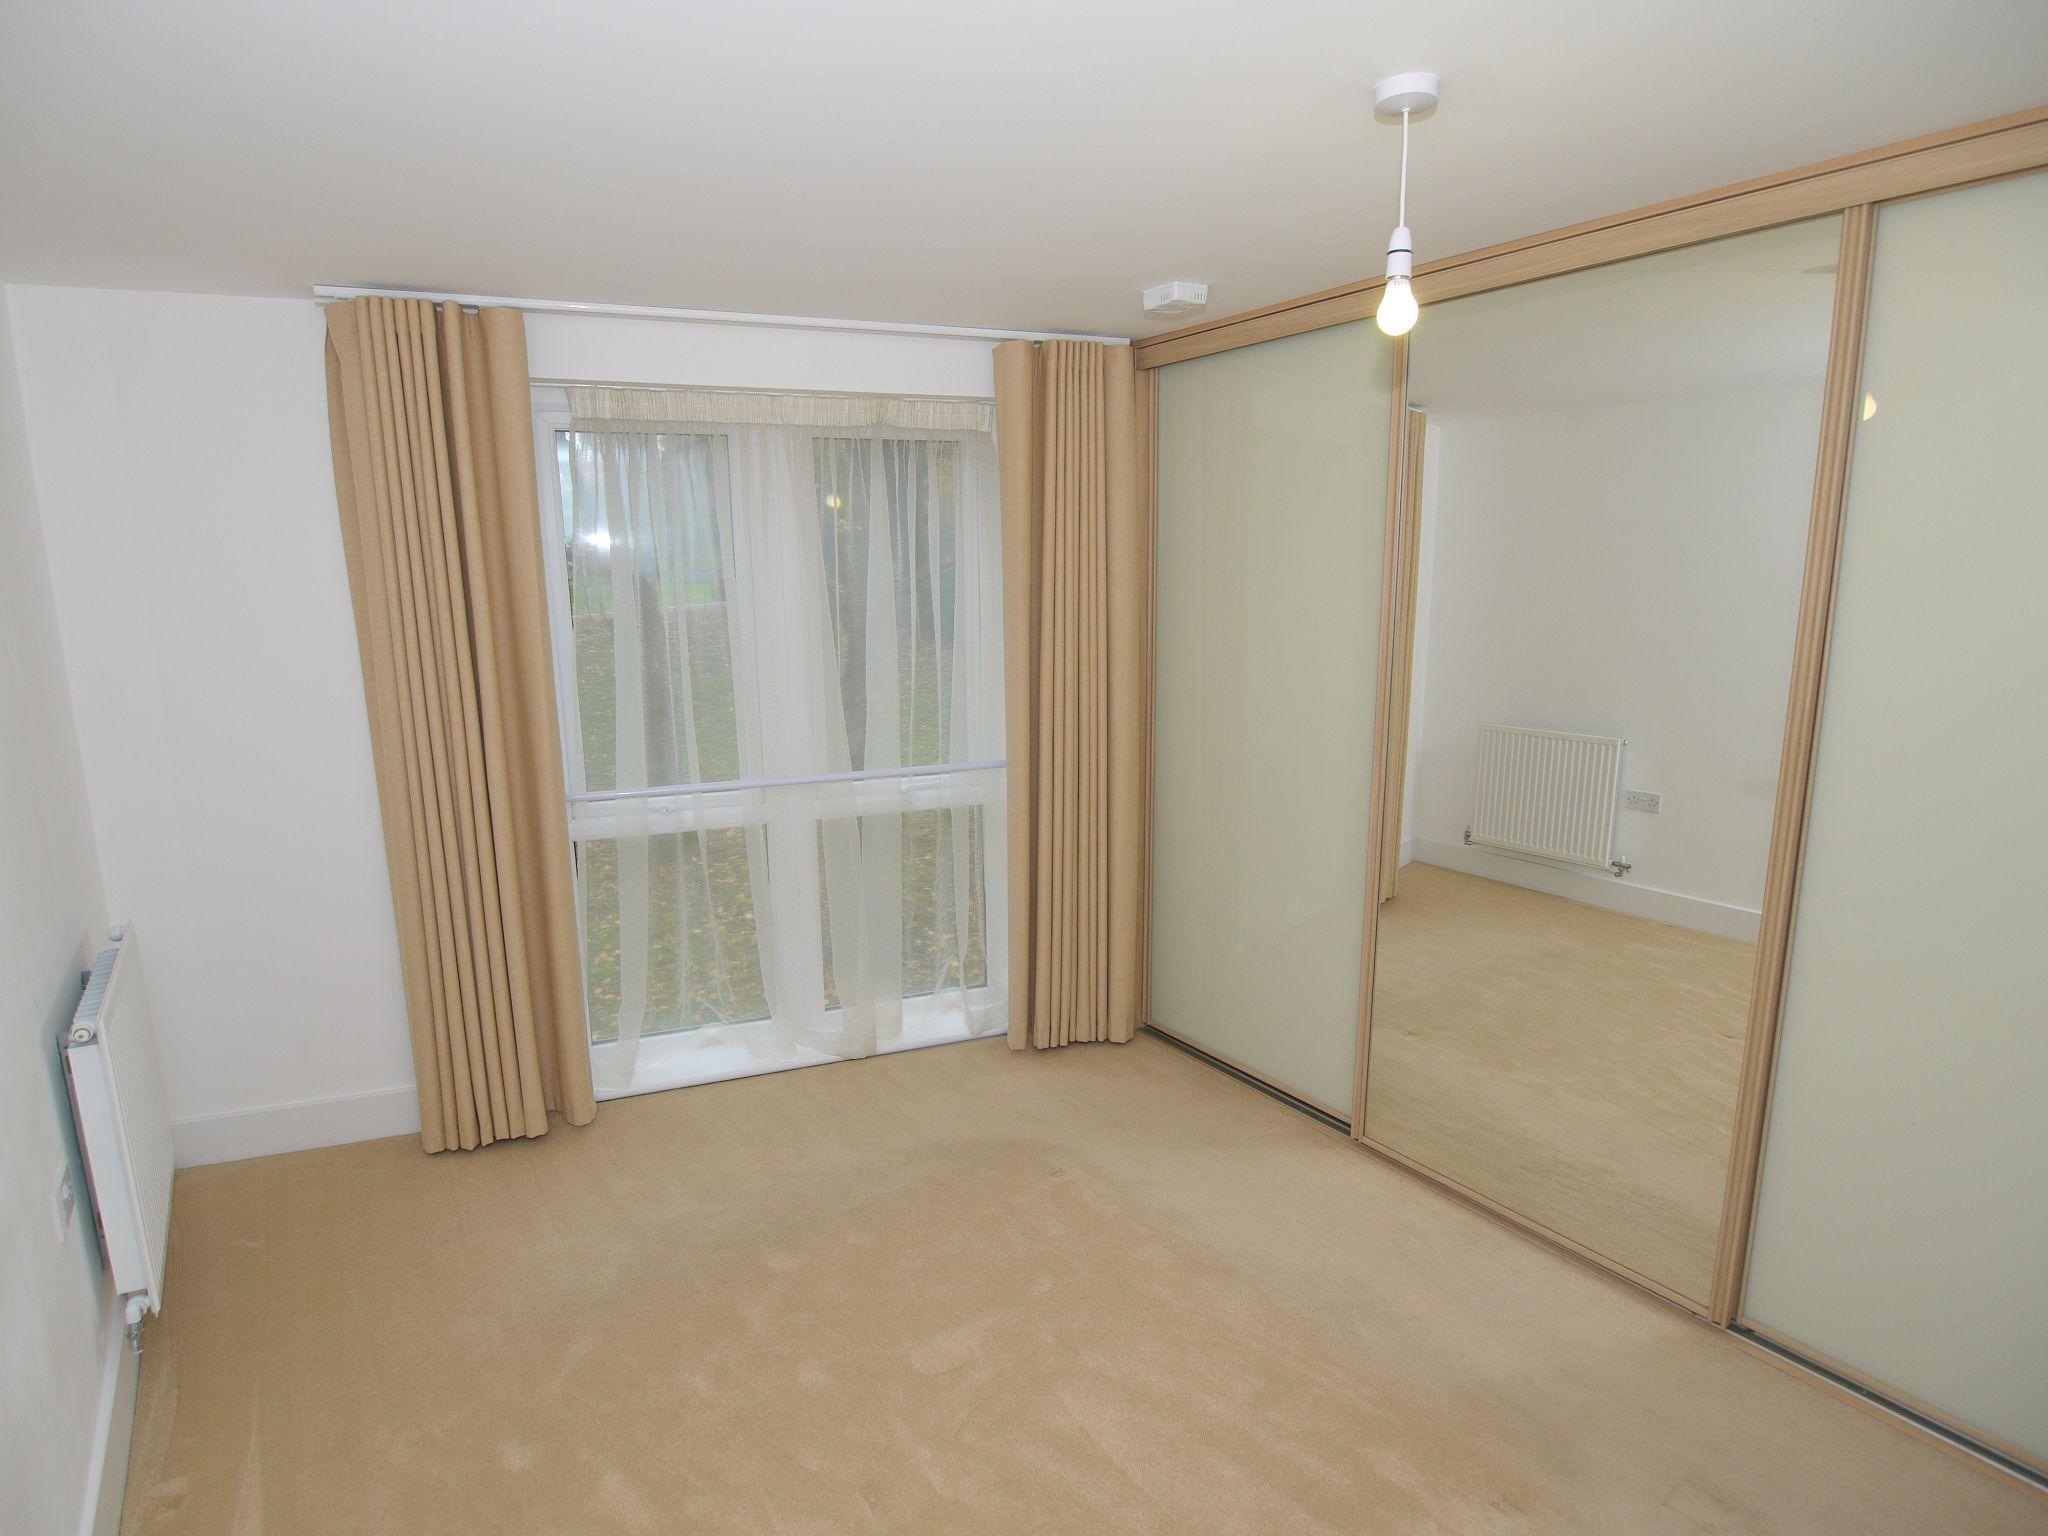 2 bedroom apartment Sale Agreed in Sevenoaks - Photograph 6